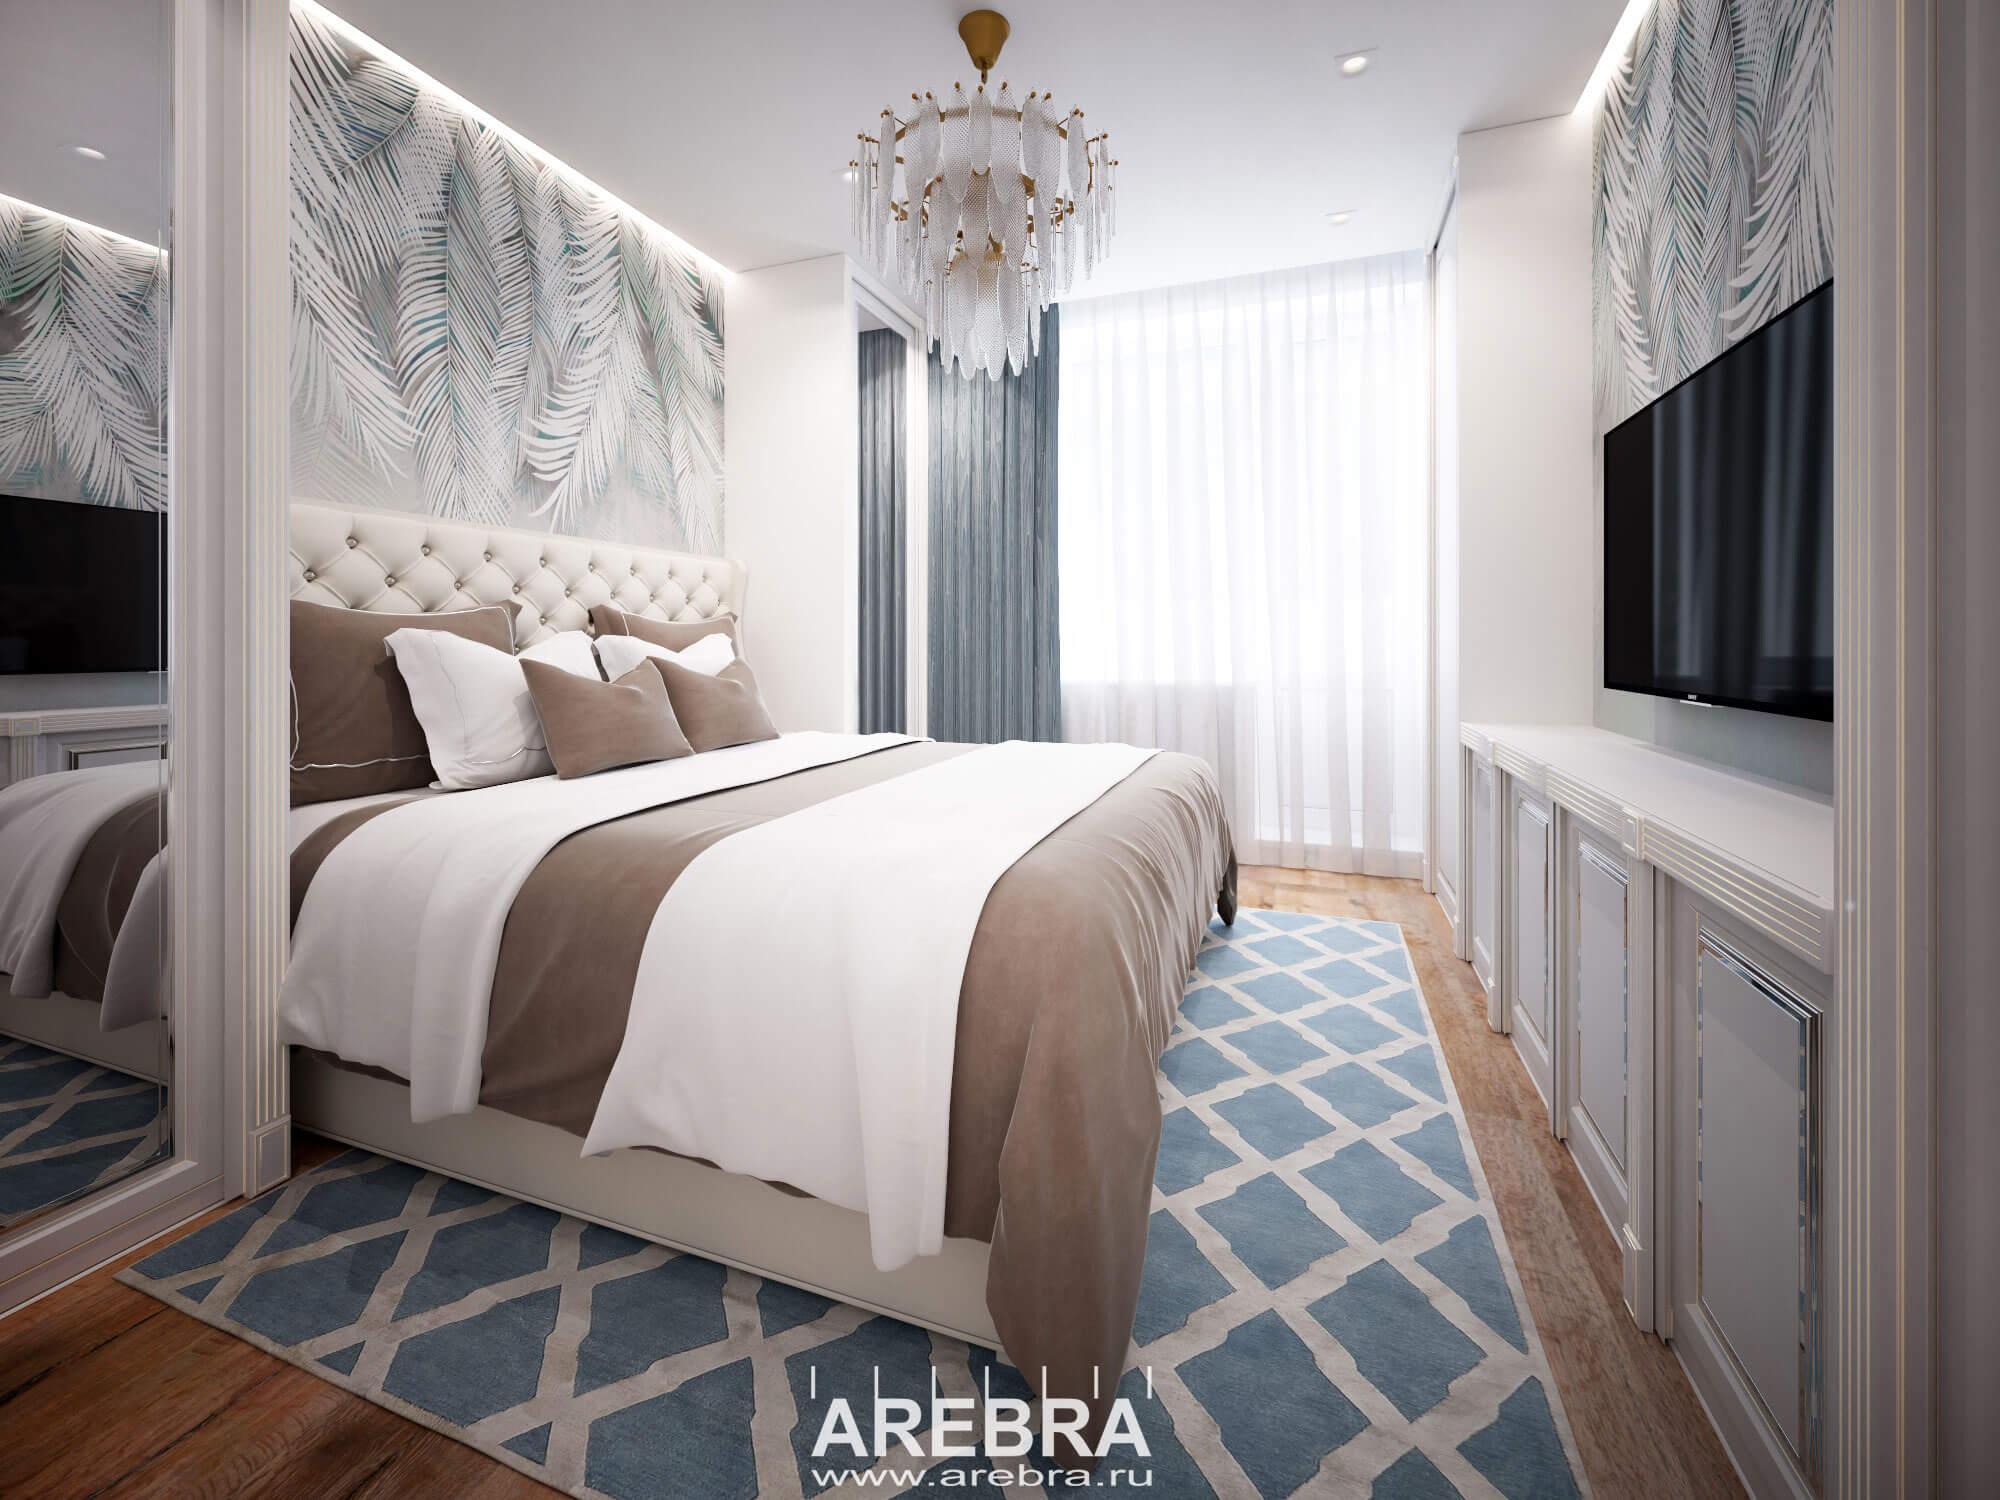 Дизайн проект интерьера квартиры по адресу г. Санкт-Петербург ул. Гжатская, д.22, корп.3